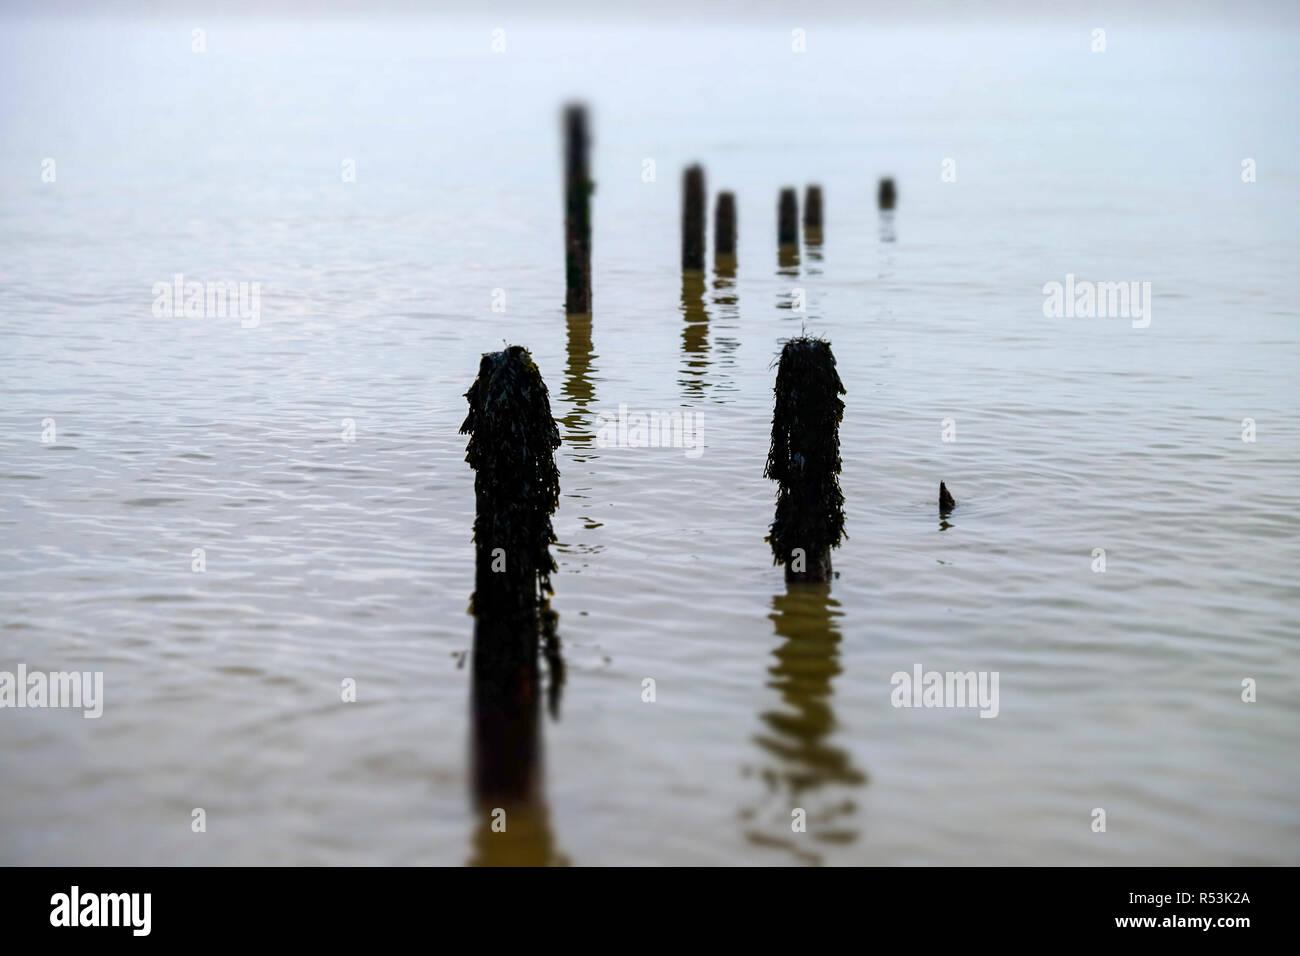 Wooden breakwaters - Stock Image